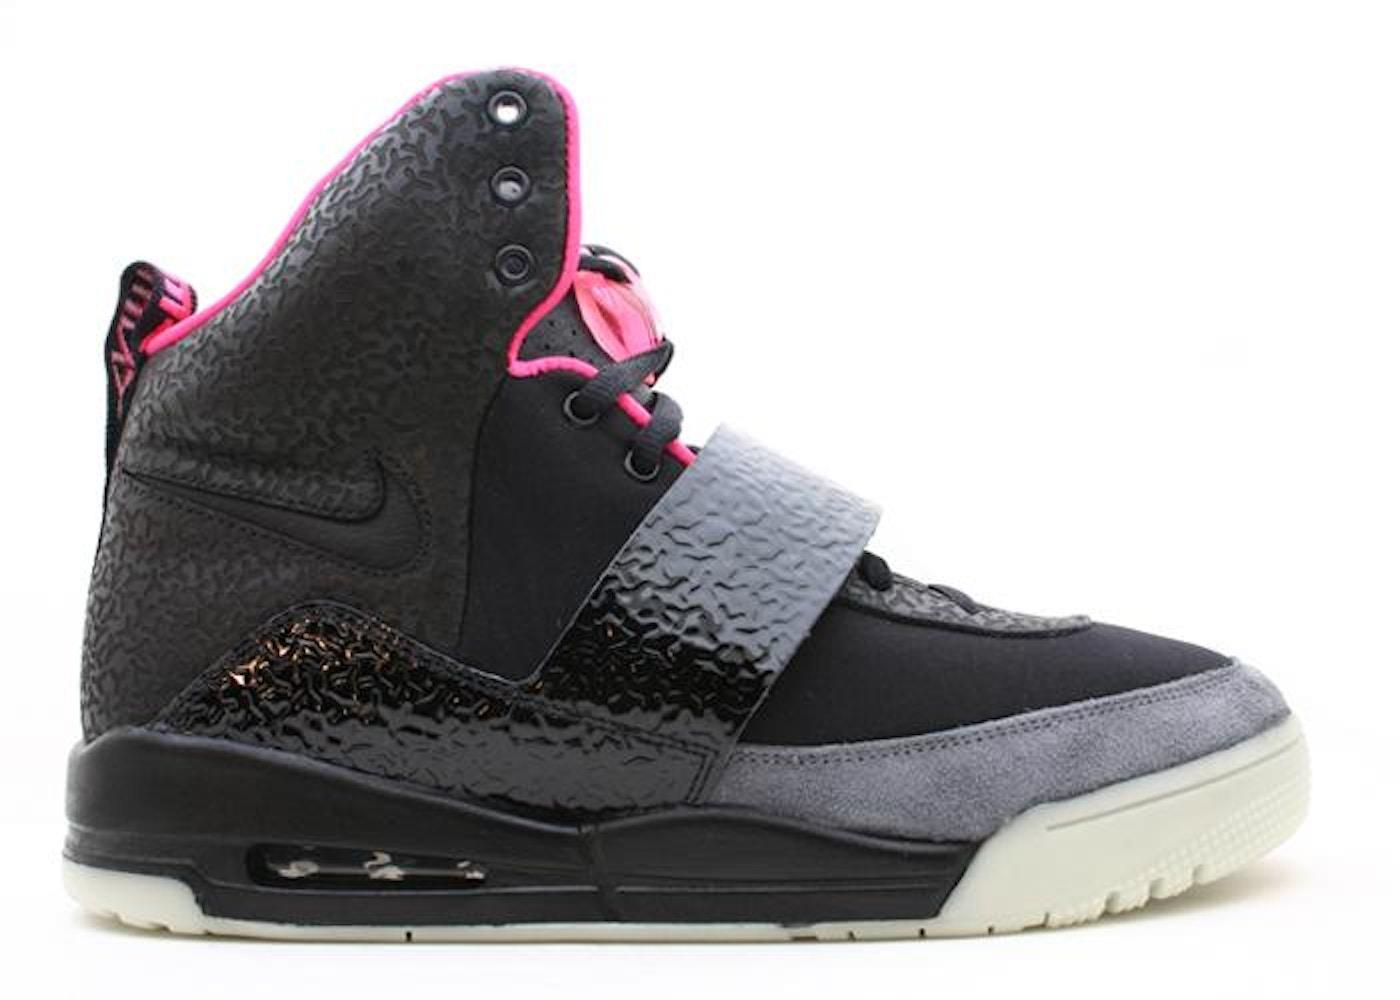 6d7c00dfdece3 Buy Nike Other Shoes   Deadstock Sneakers